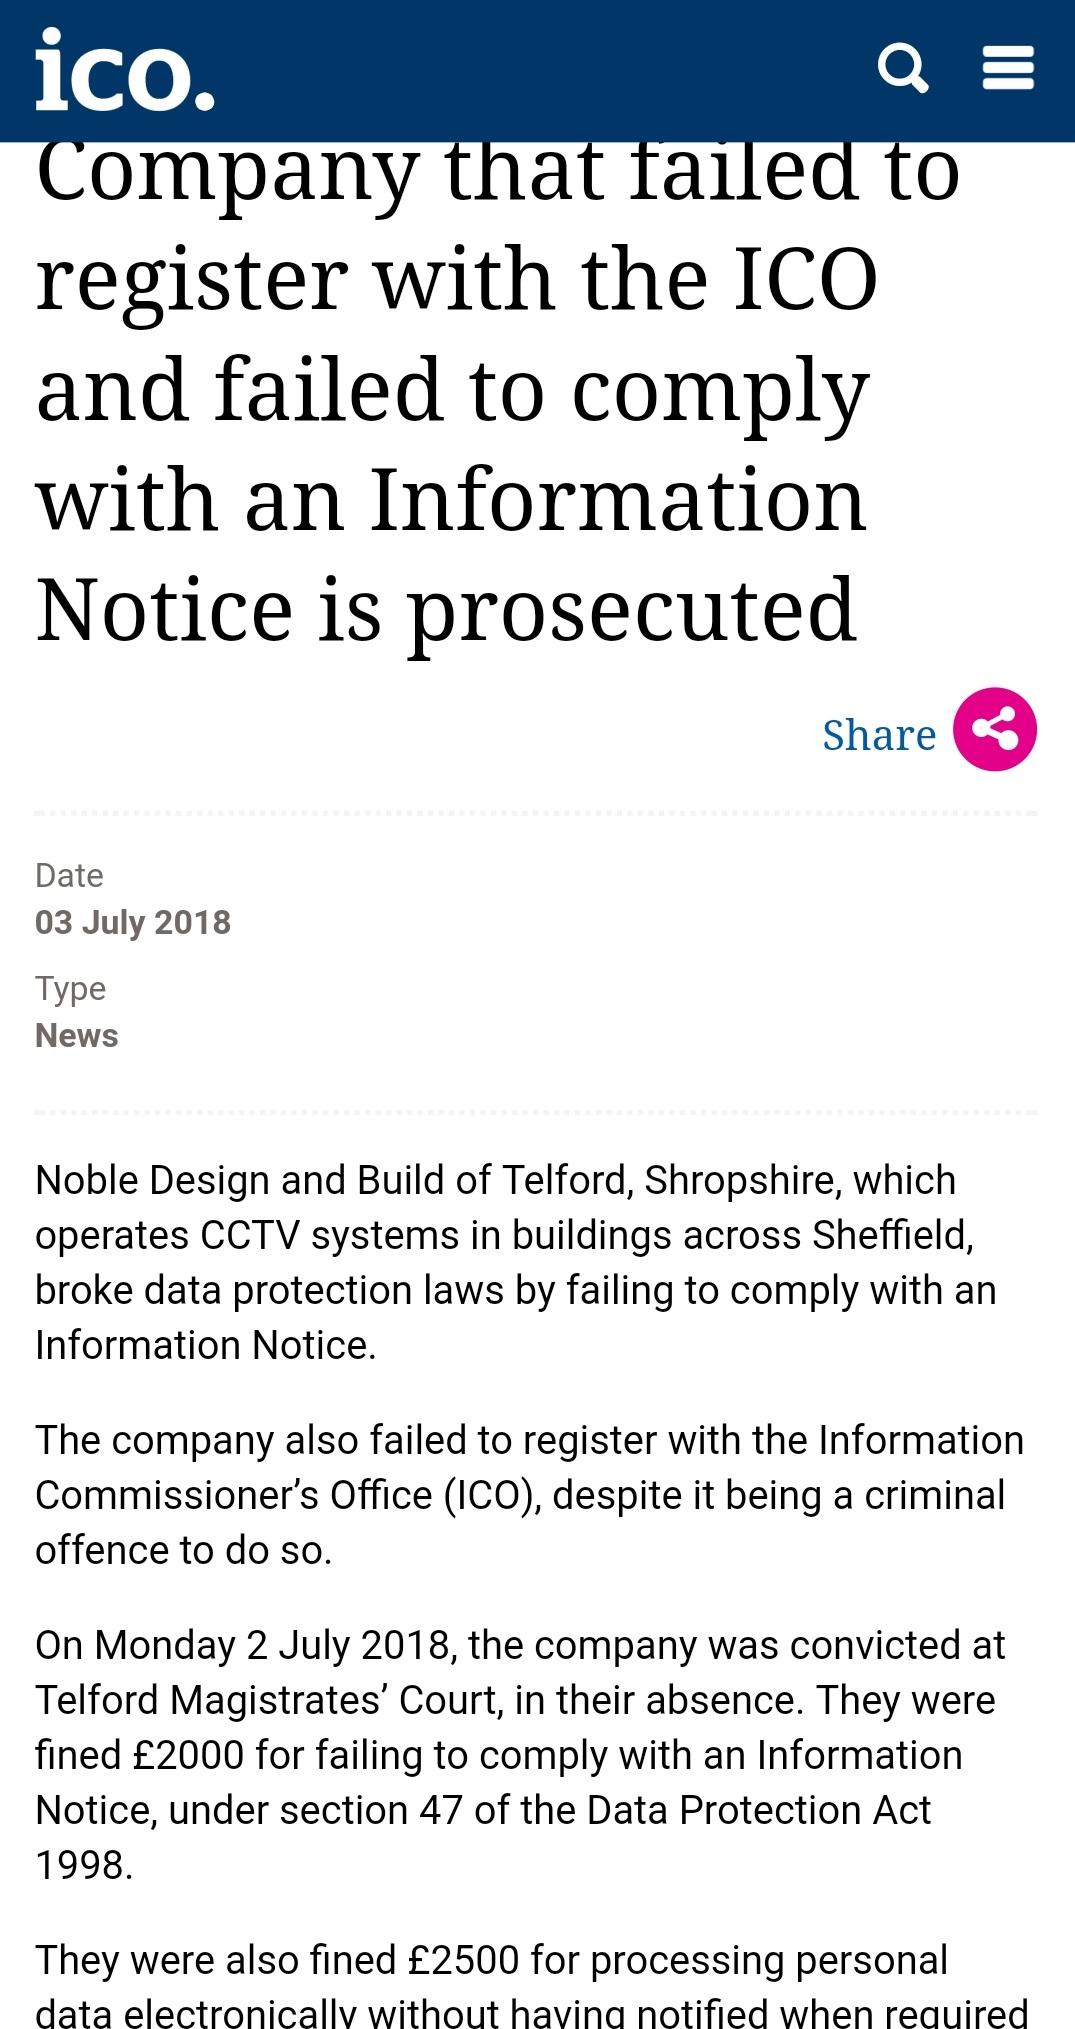 ico company failed to register